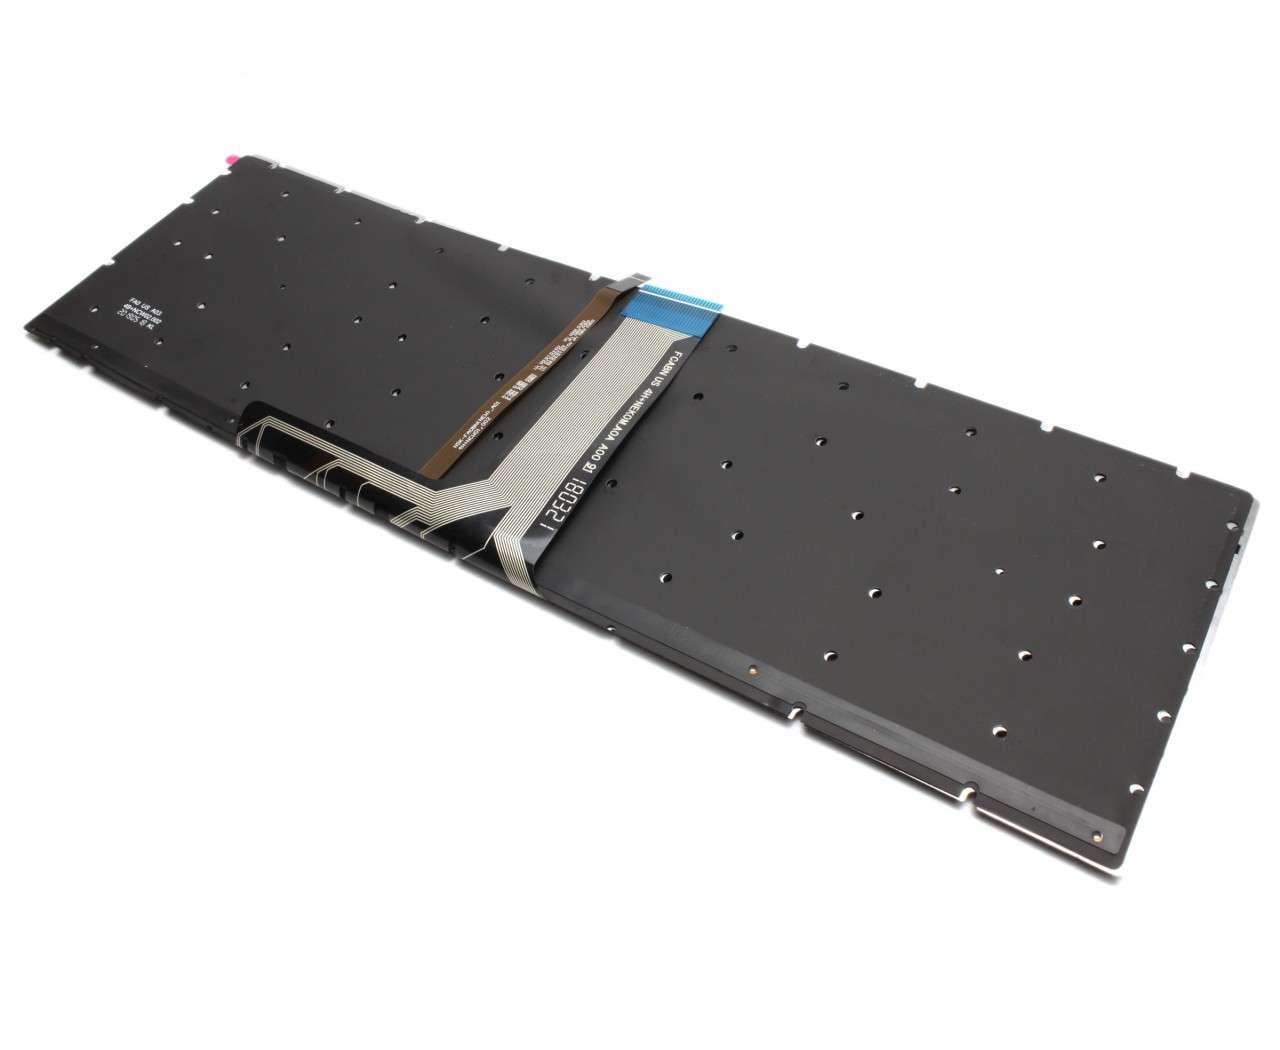 Tastatura MSI WS60 2OJ iluminata layout US fara rama enter mic